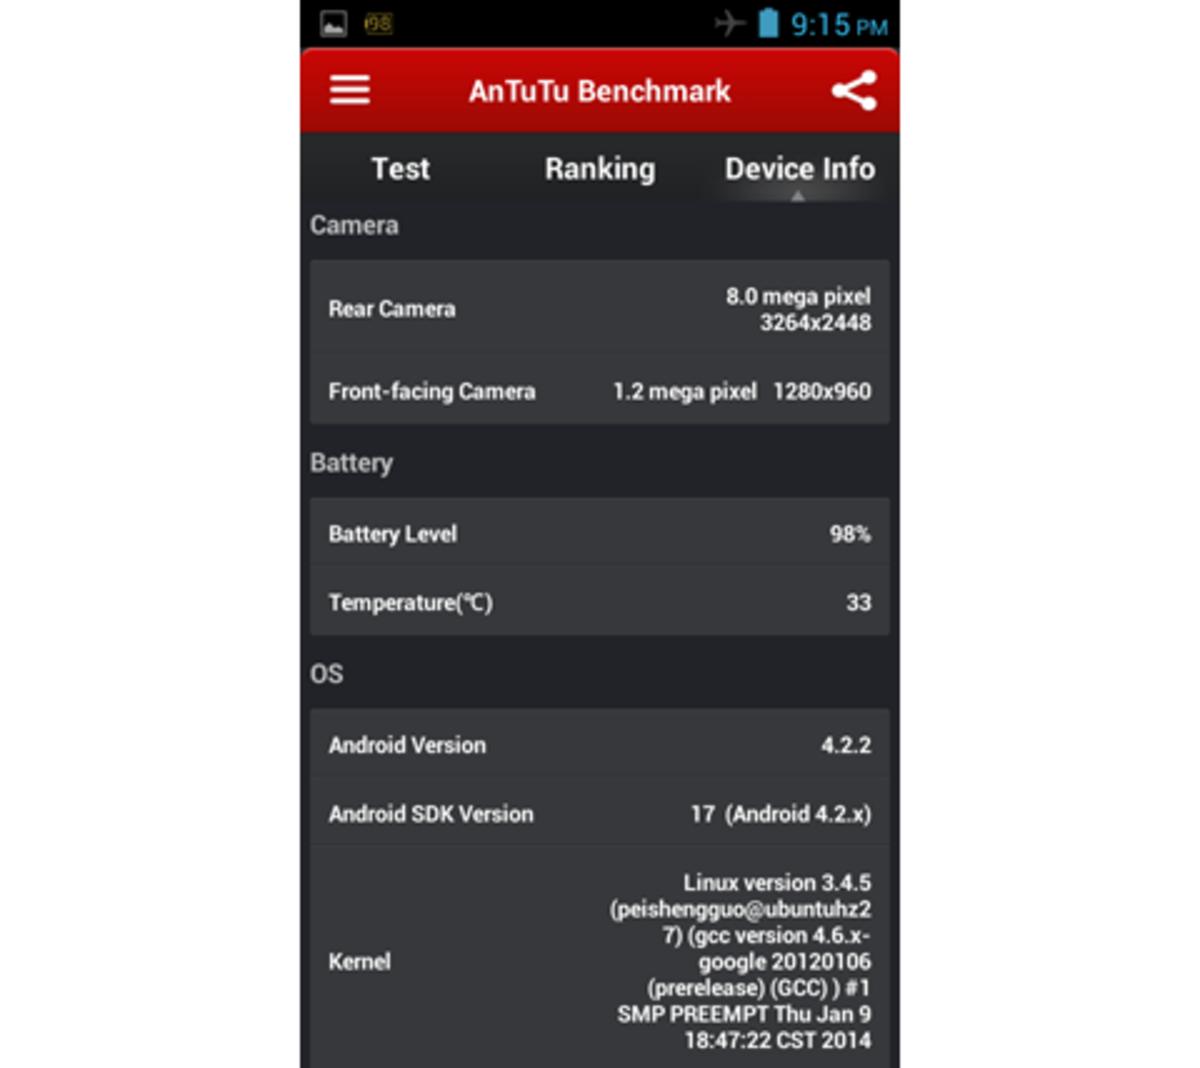 AnTuTu Benchmark 4